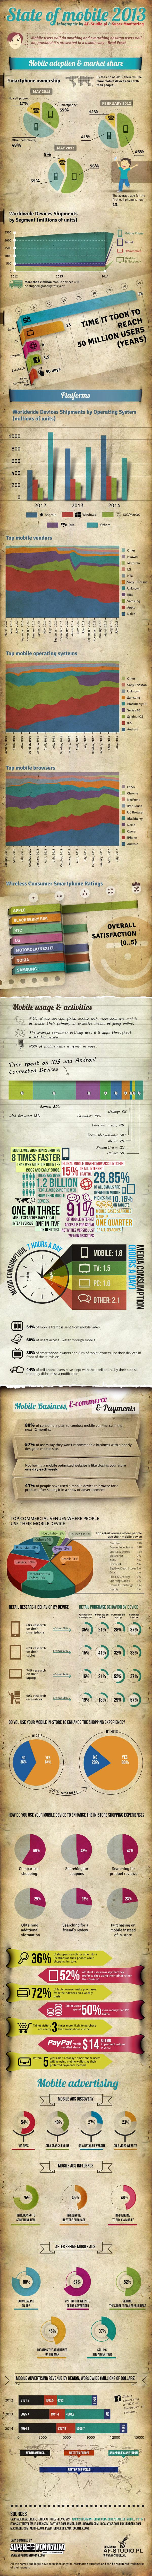 Infographic-2013-Mobile-Growth-Statistics-BestBuzz